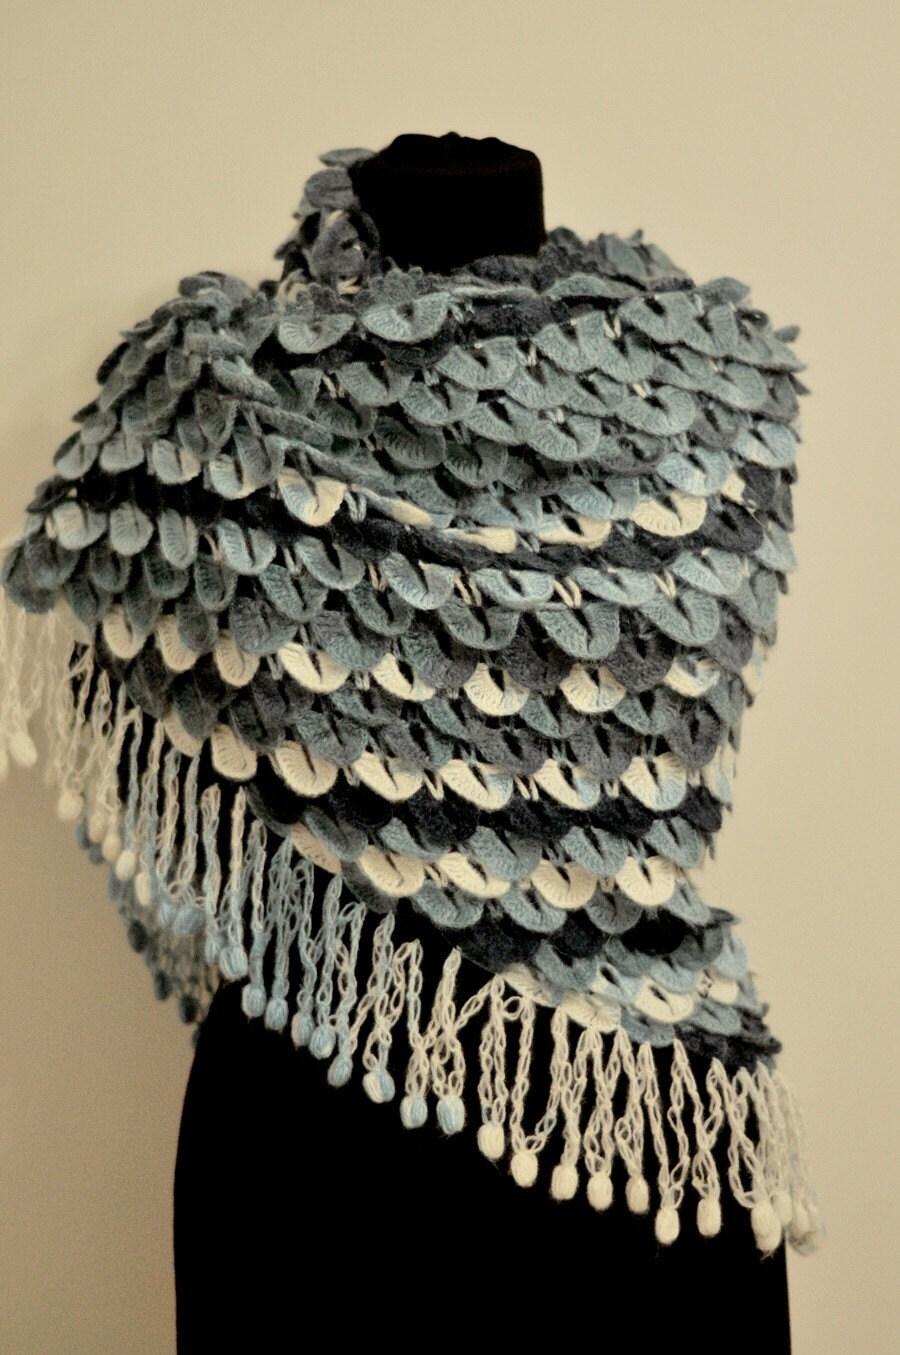 Handknit تمساح دریای دختر موی مرغوز شال / بی اعتنایی تلقی / capelet / گرم / به سرقت برده